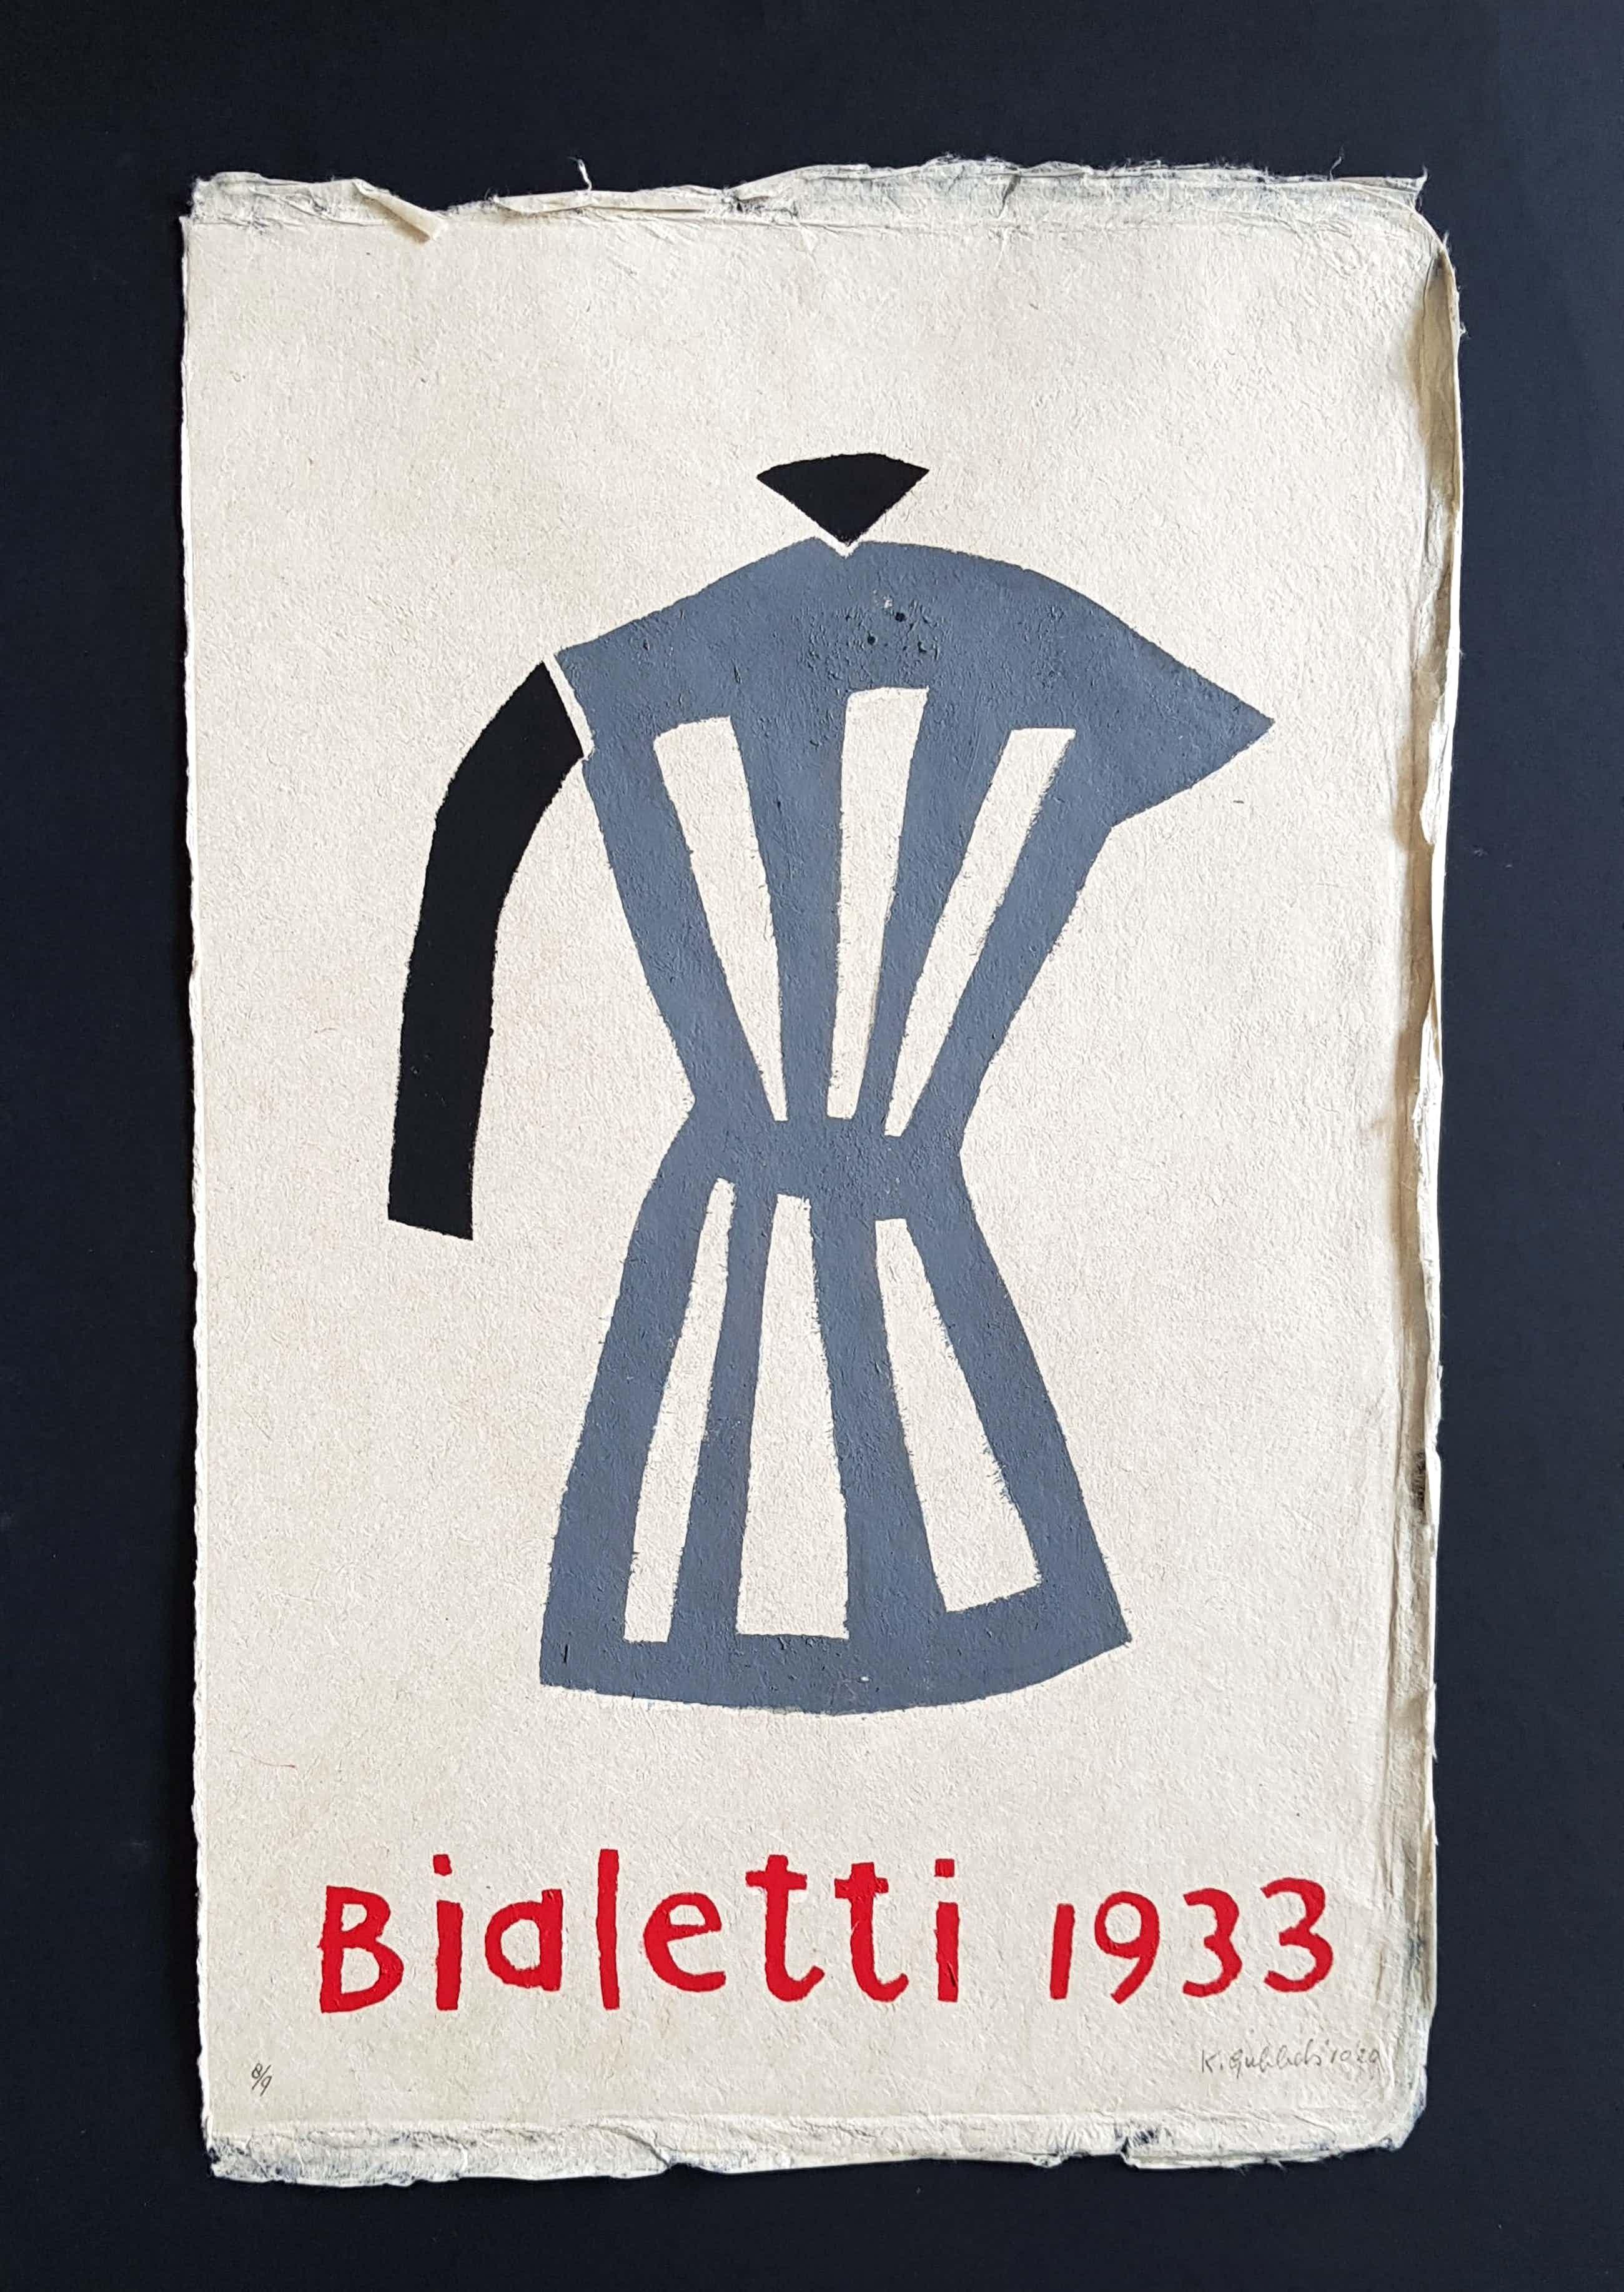 Klaas Gubbels - 'Bialetti 1933' (sjabloondruk) 63 x 39 cm Kleine oplage 8/9 kopen? Bied vanaf 520!